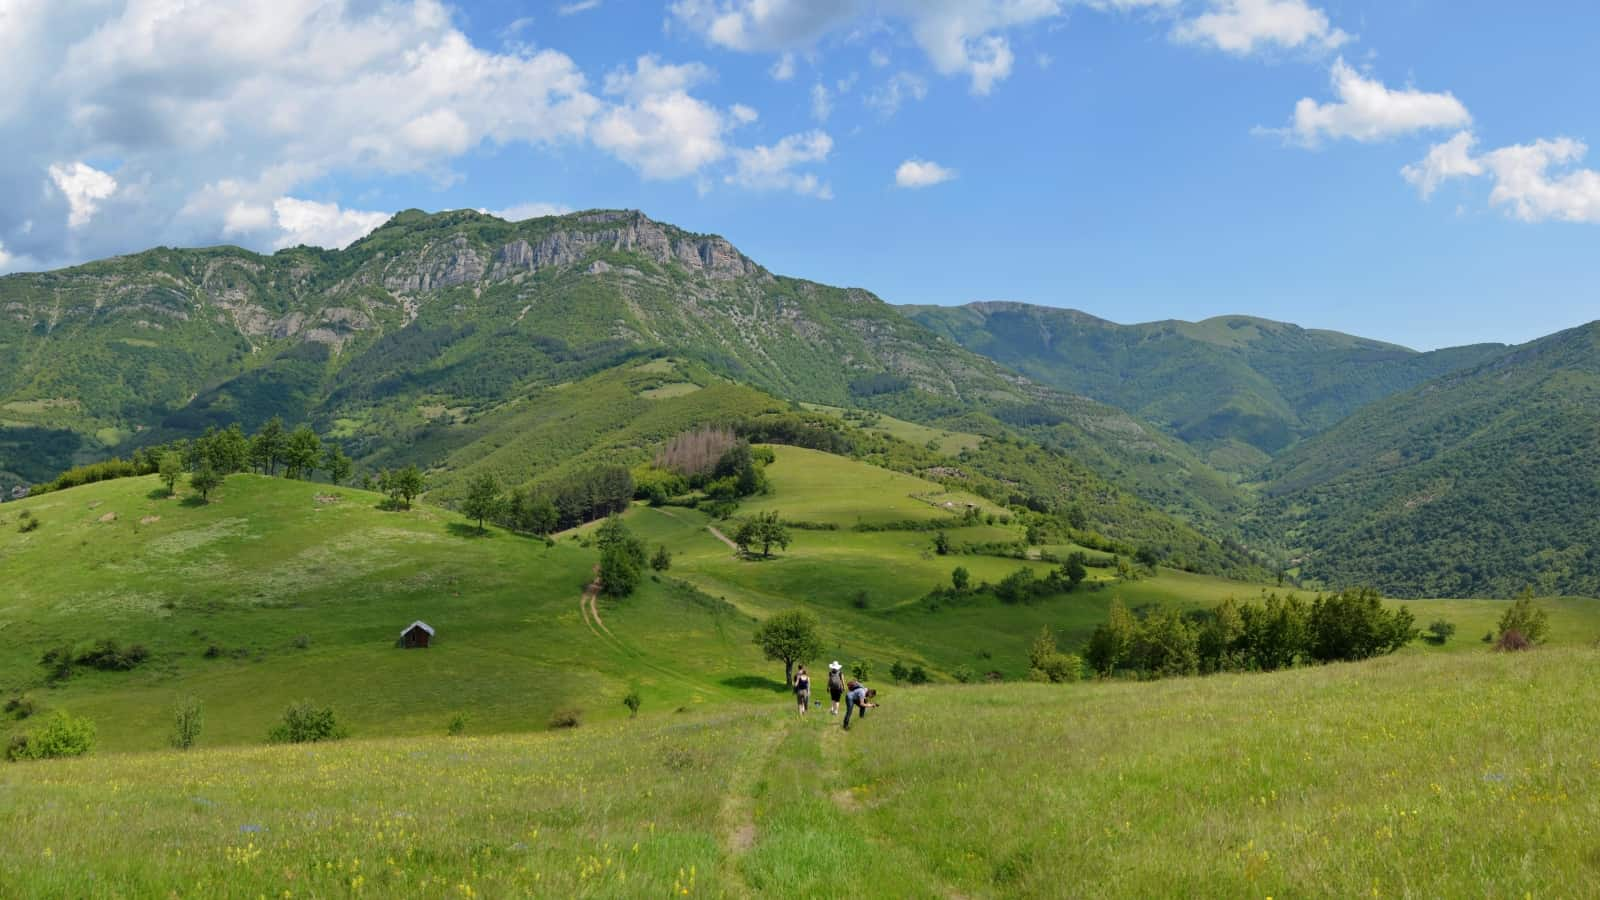 Bergwiesen mit Orchideen - Panoramaaufnahme - Foto: Vrachanski Balkan Naturpark/Krasimir Lakovski